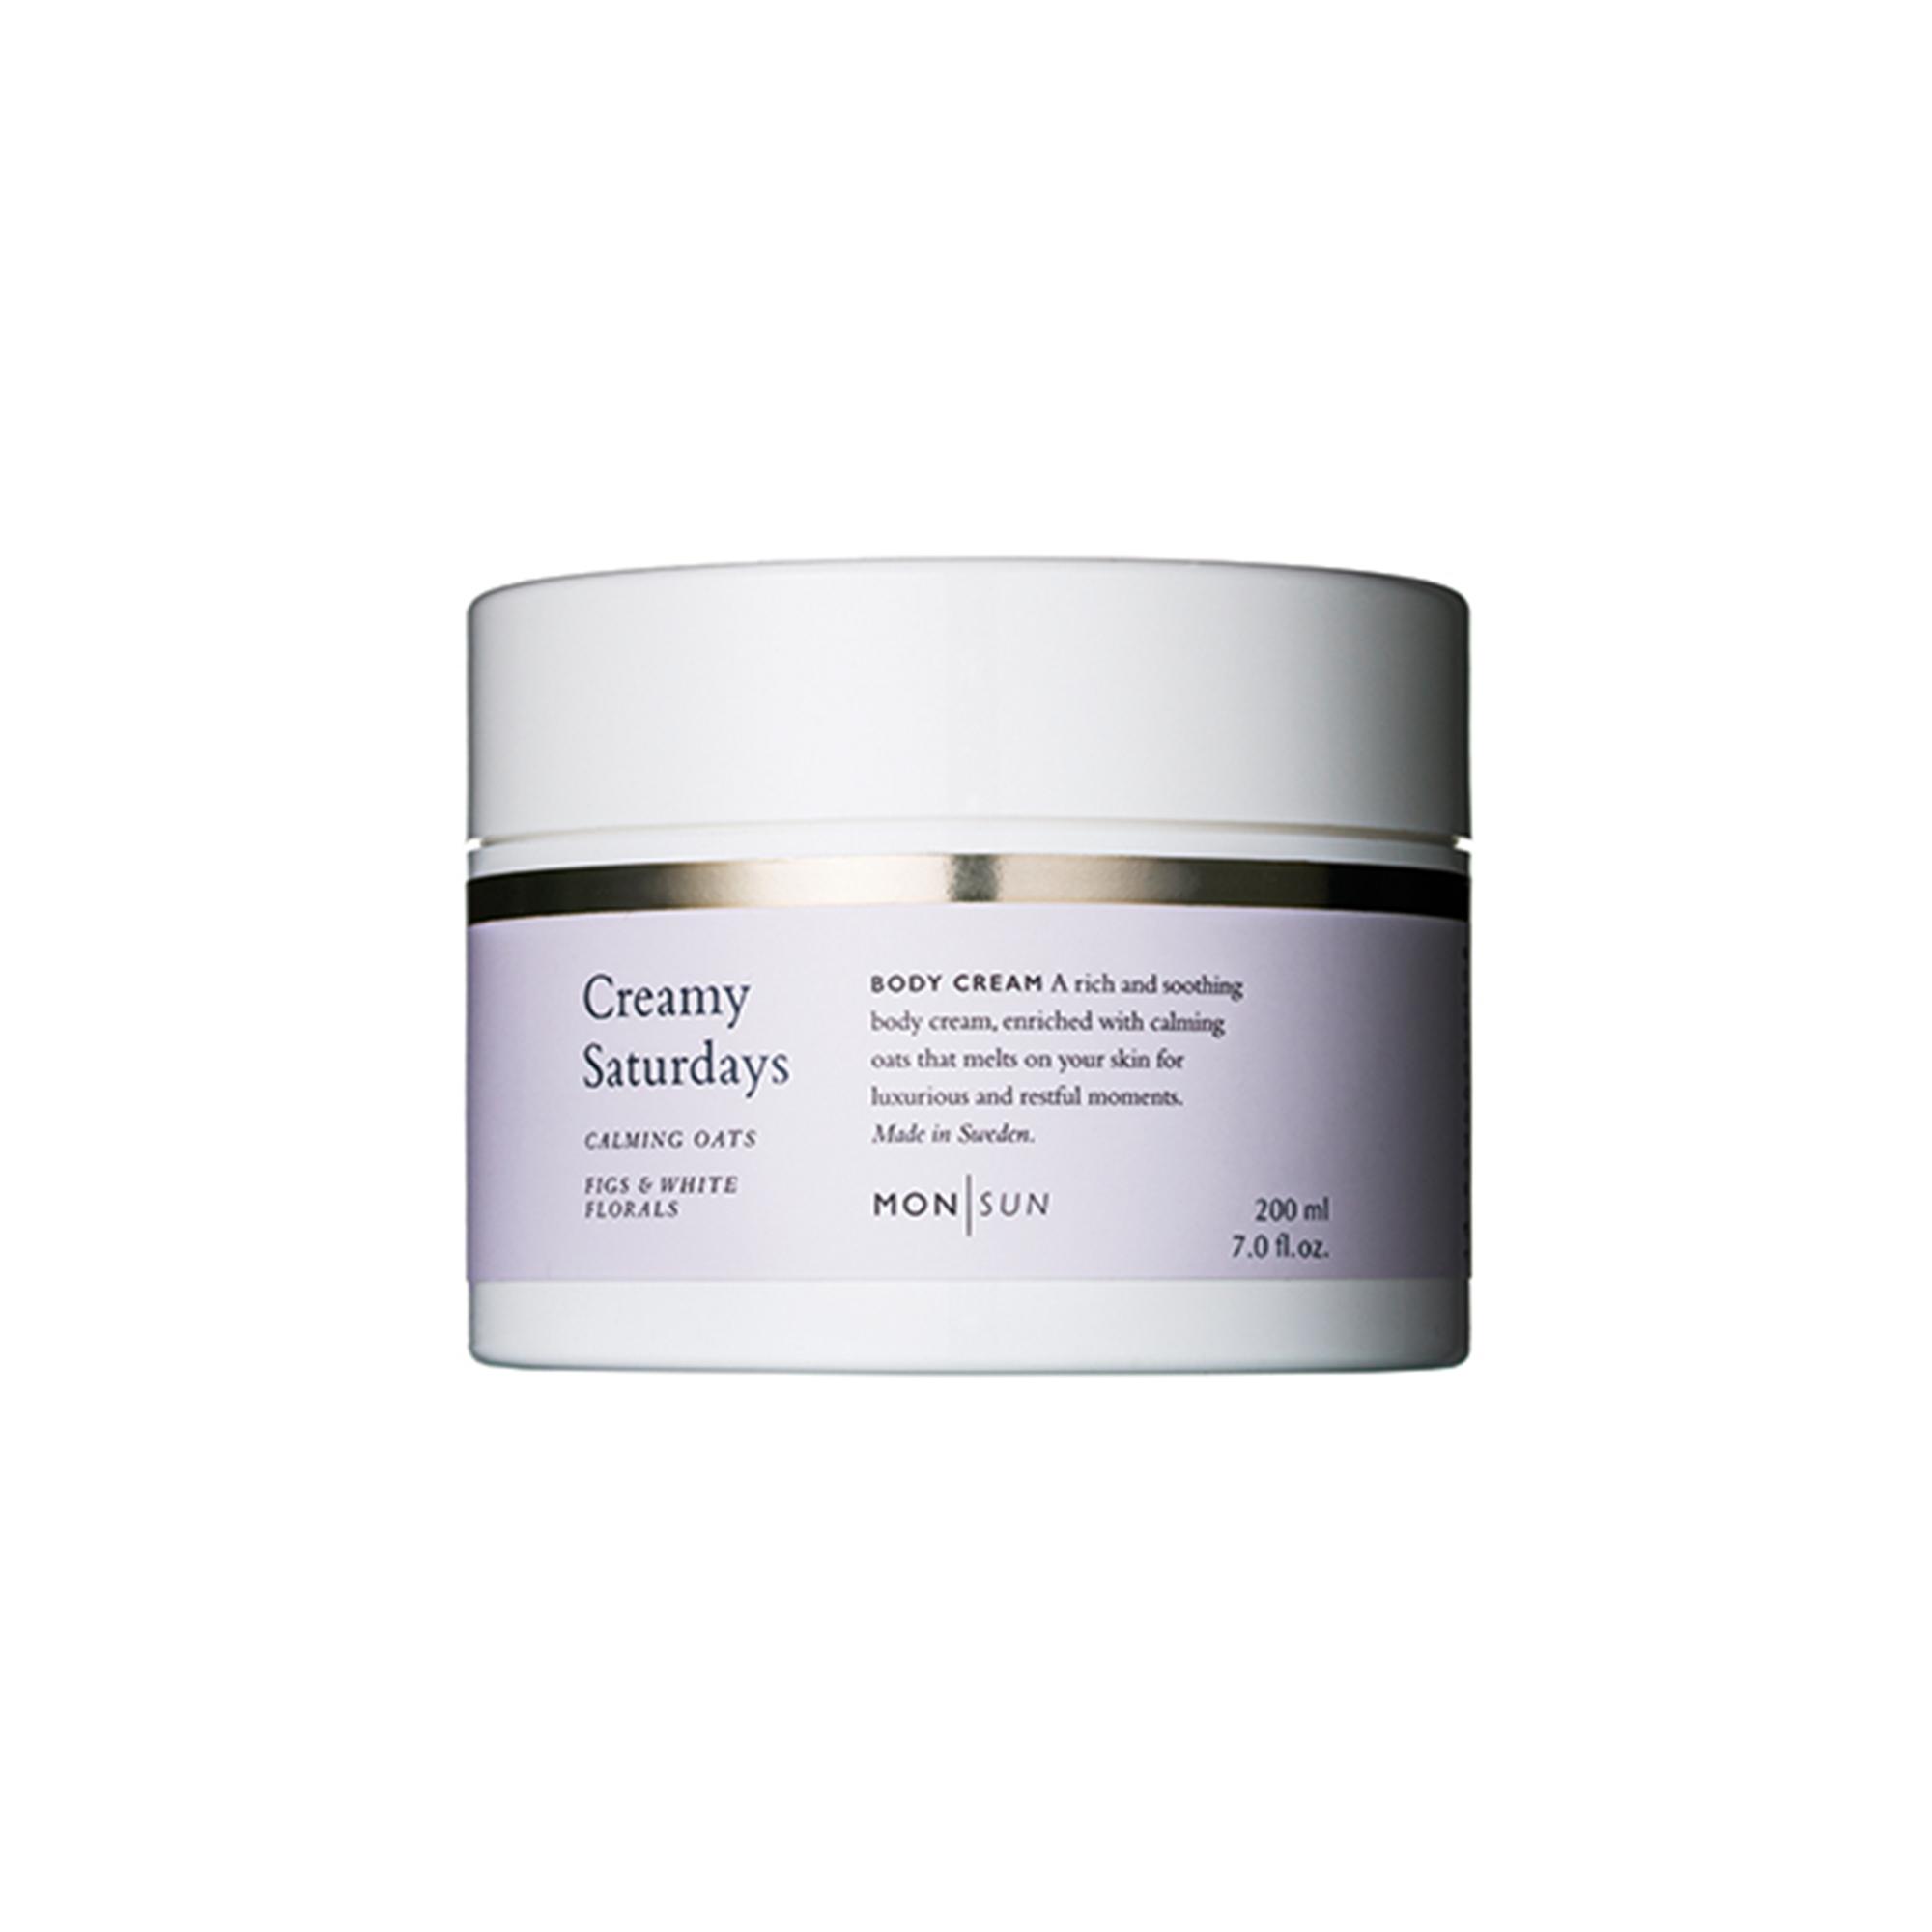 Creamy Saturdays Calming Oats Body Cream 200ml